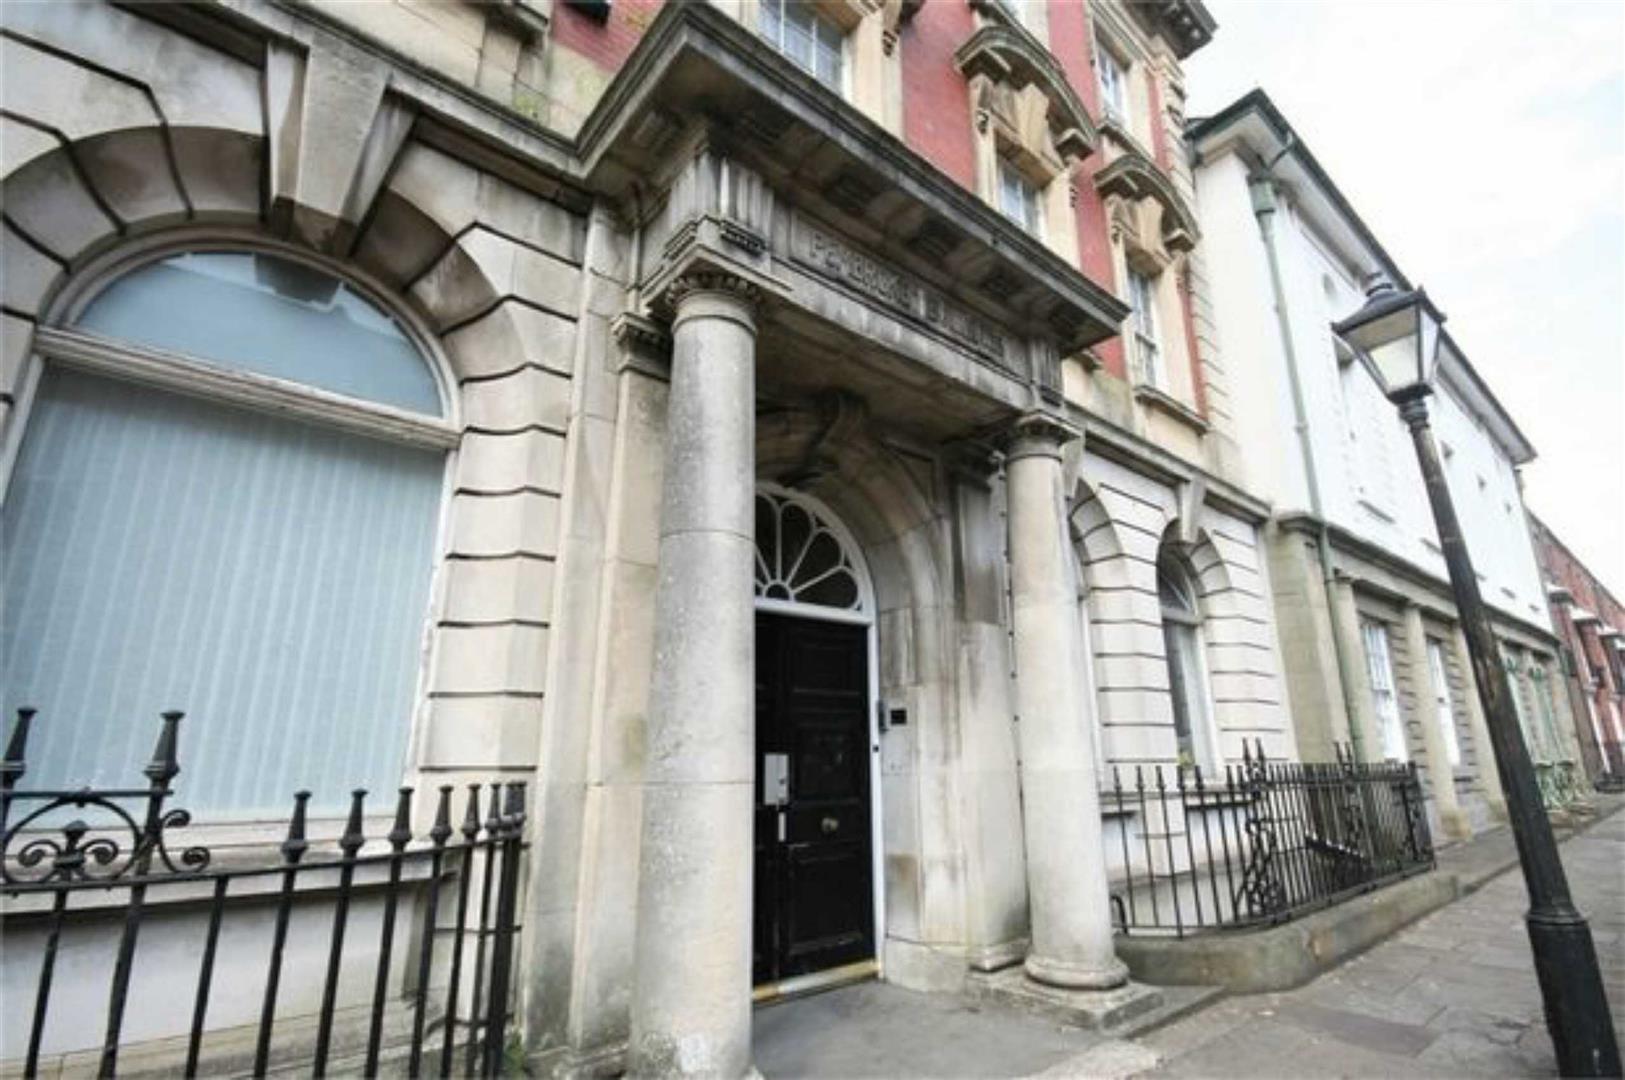 Pembroke Buildings, Cambrian Place, Marina, Swansea, SA1 1RL